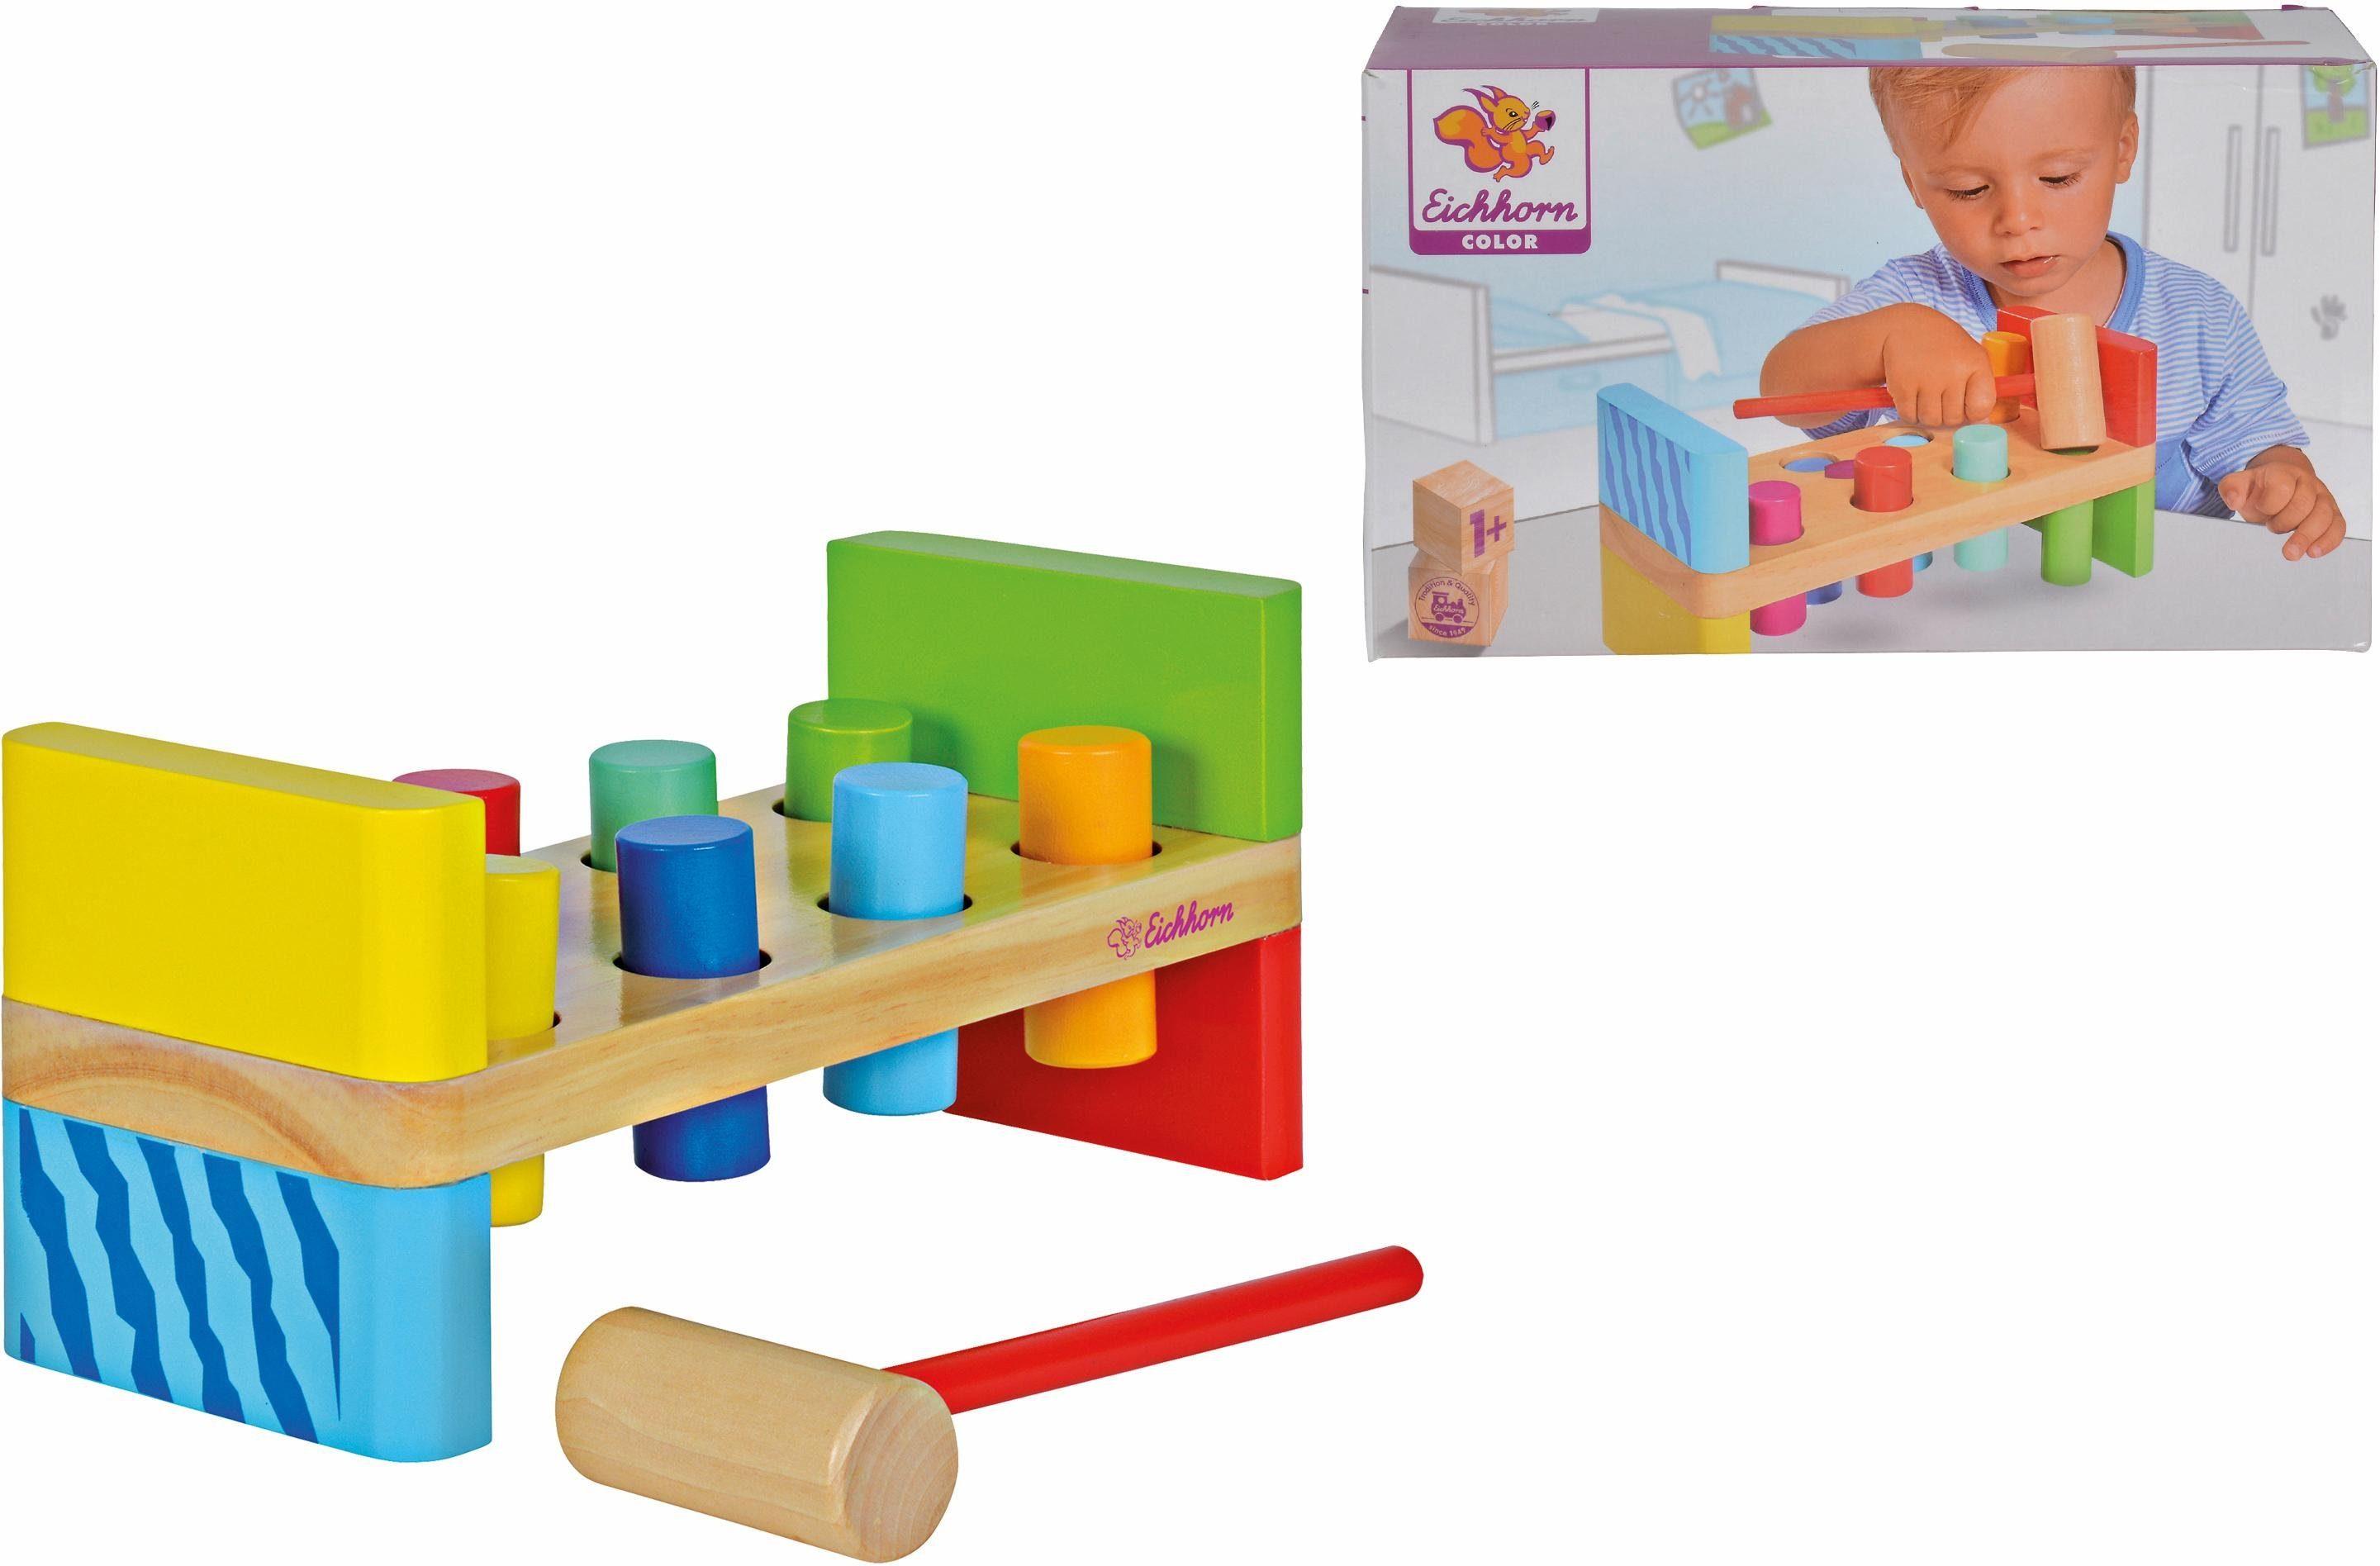 Eichhorn Holzspielzeug, »Color, Klopfbank«